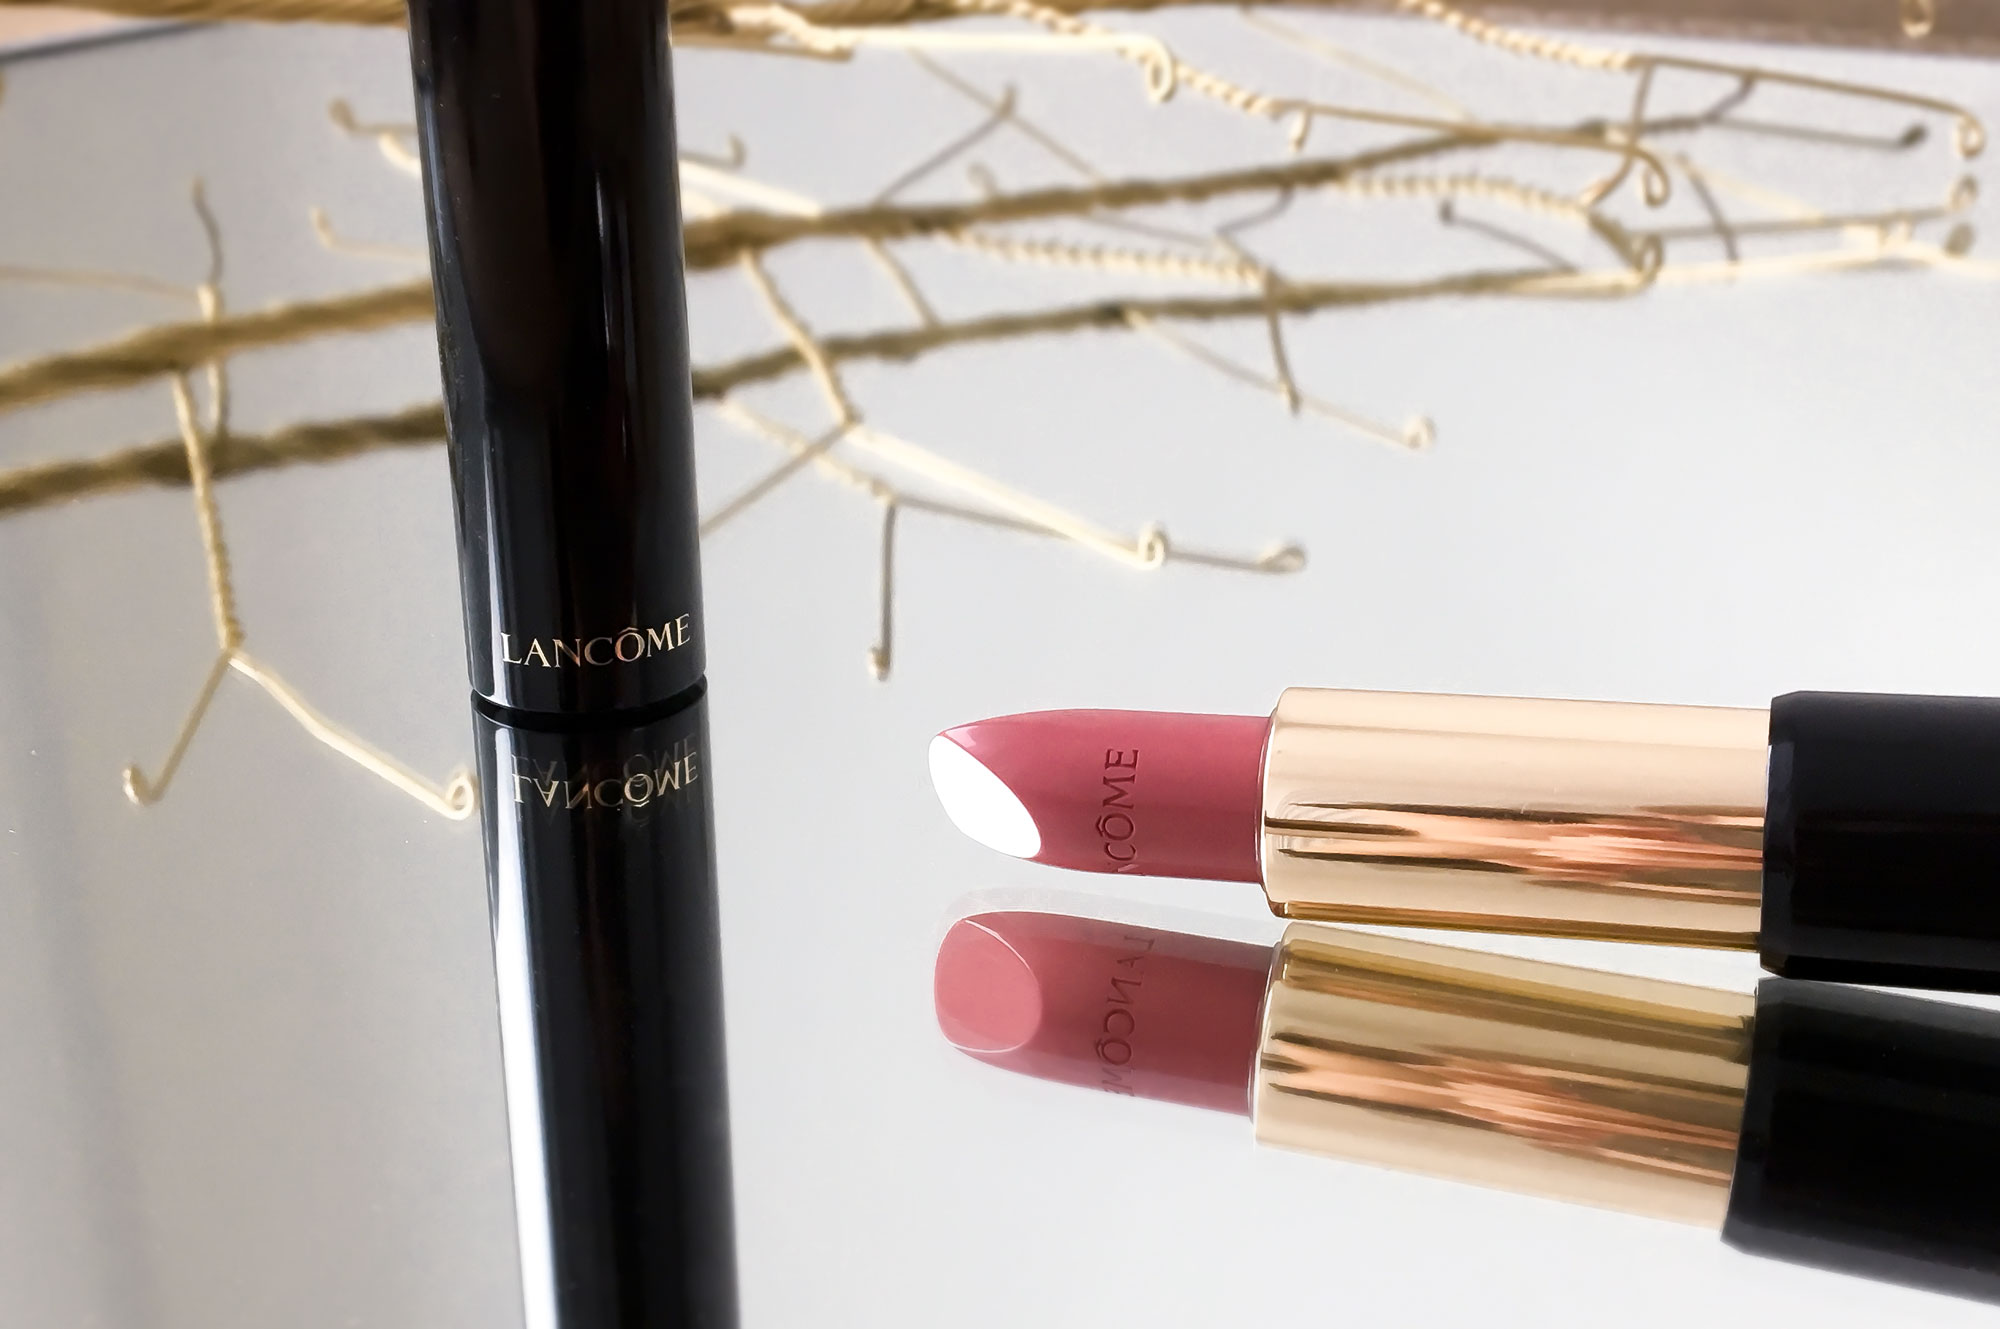 Lancome L'Absolu Rouge 354 Rose Rhapsodie lipstick closeup